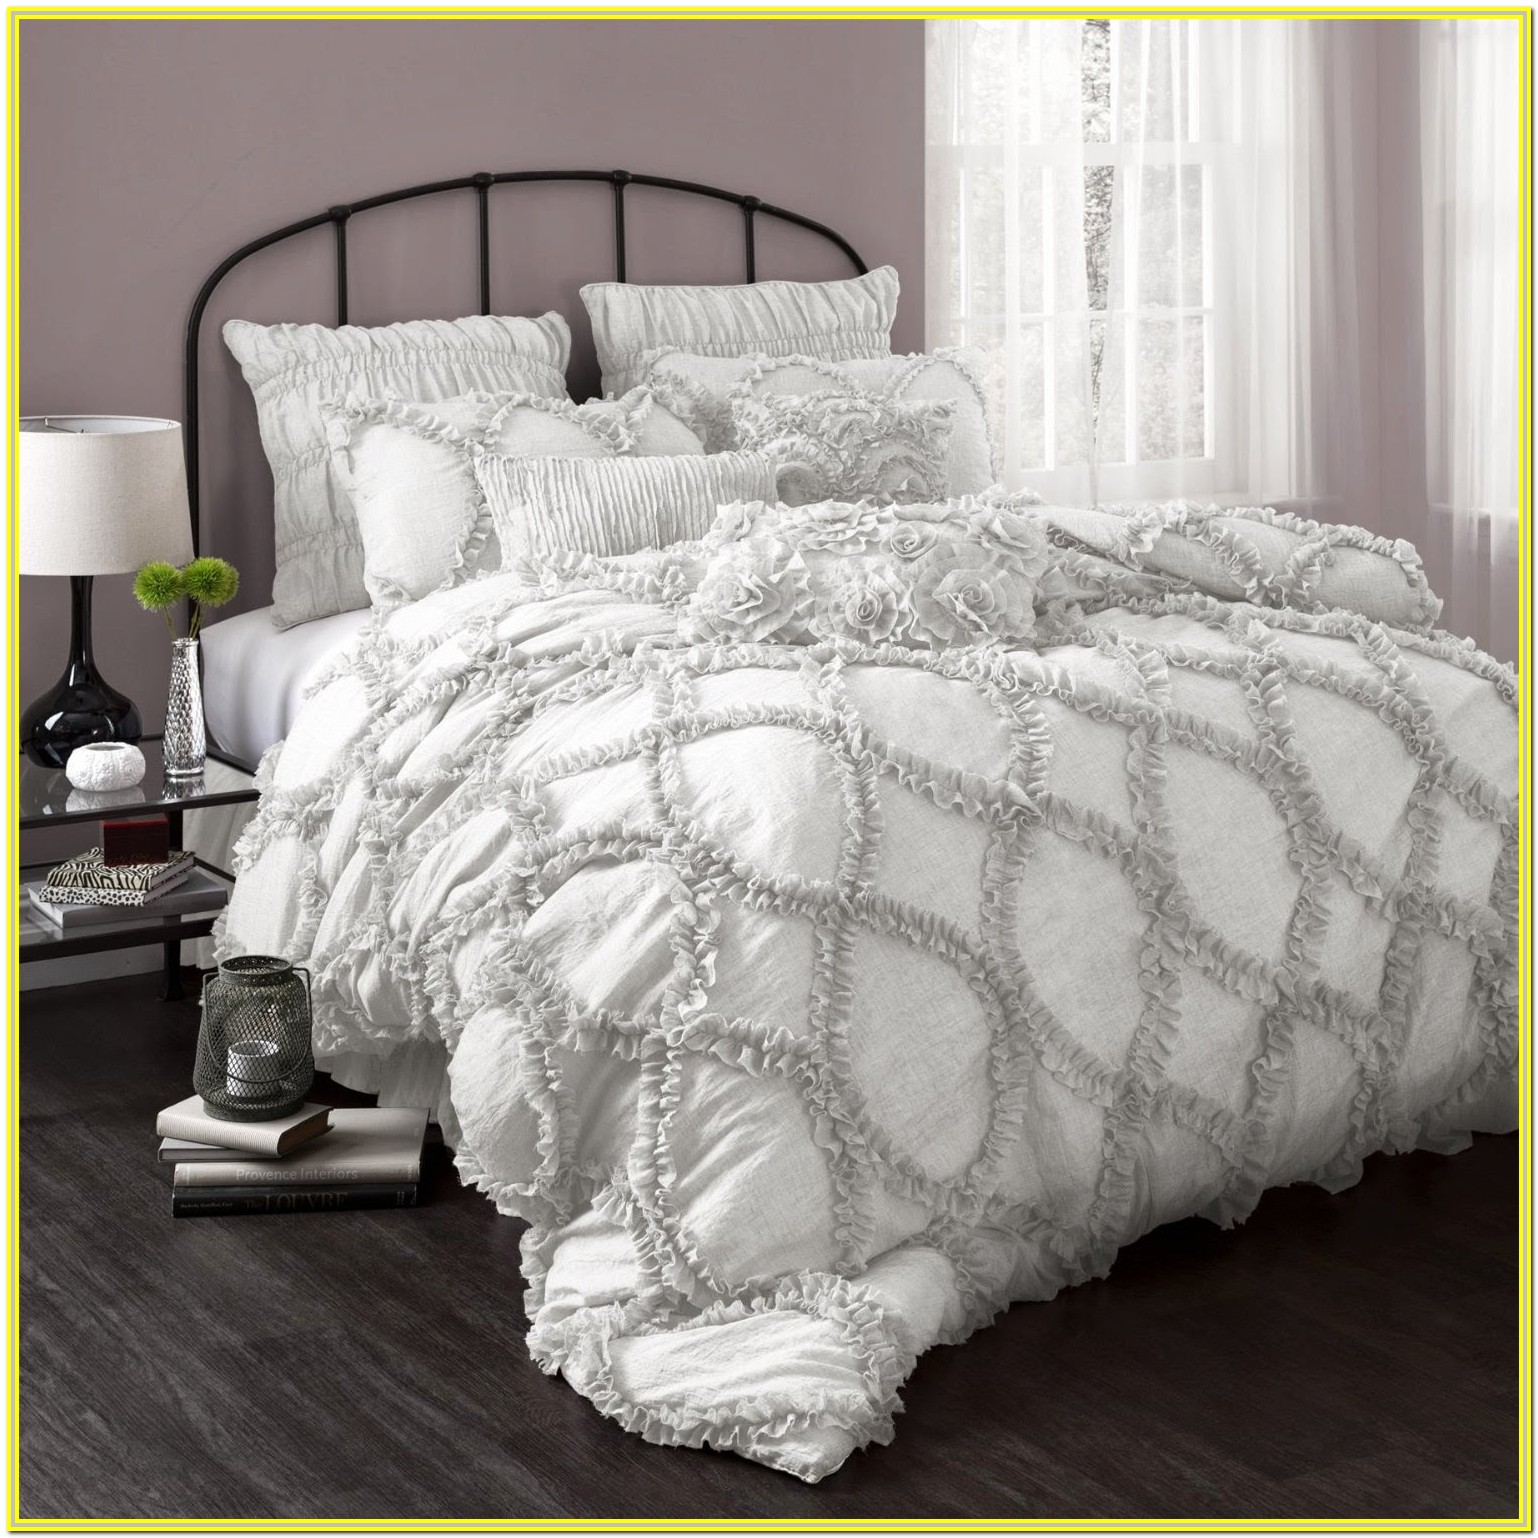 White And Grey Comforter Set